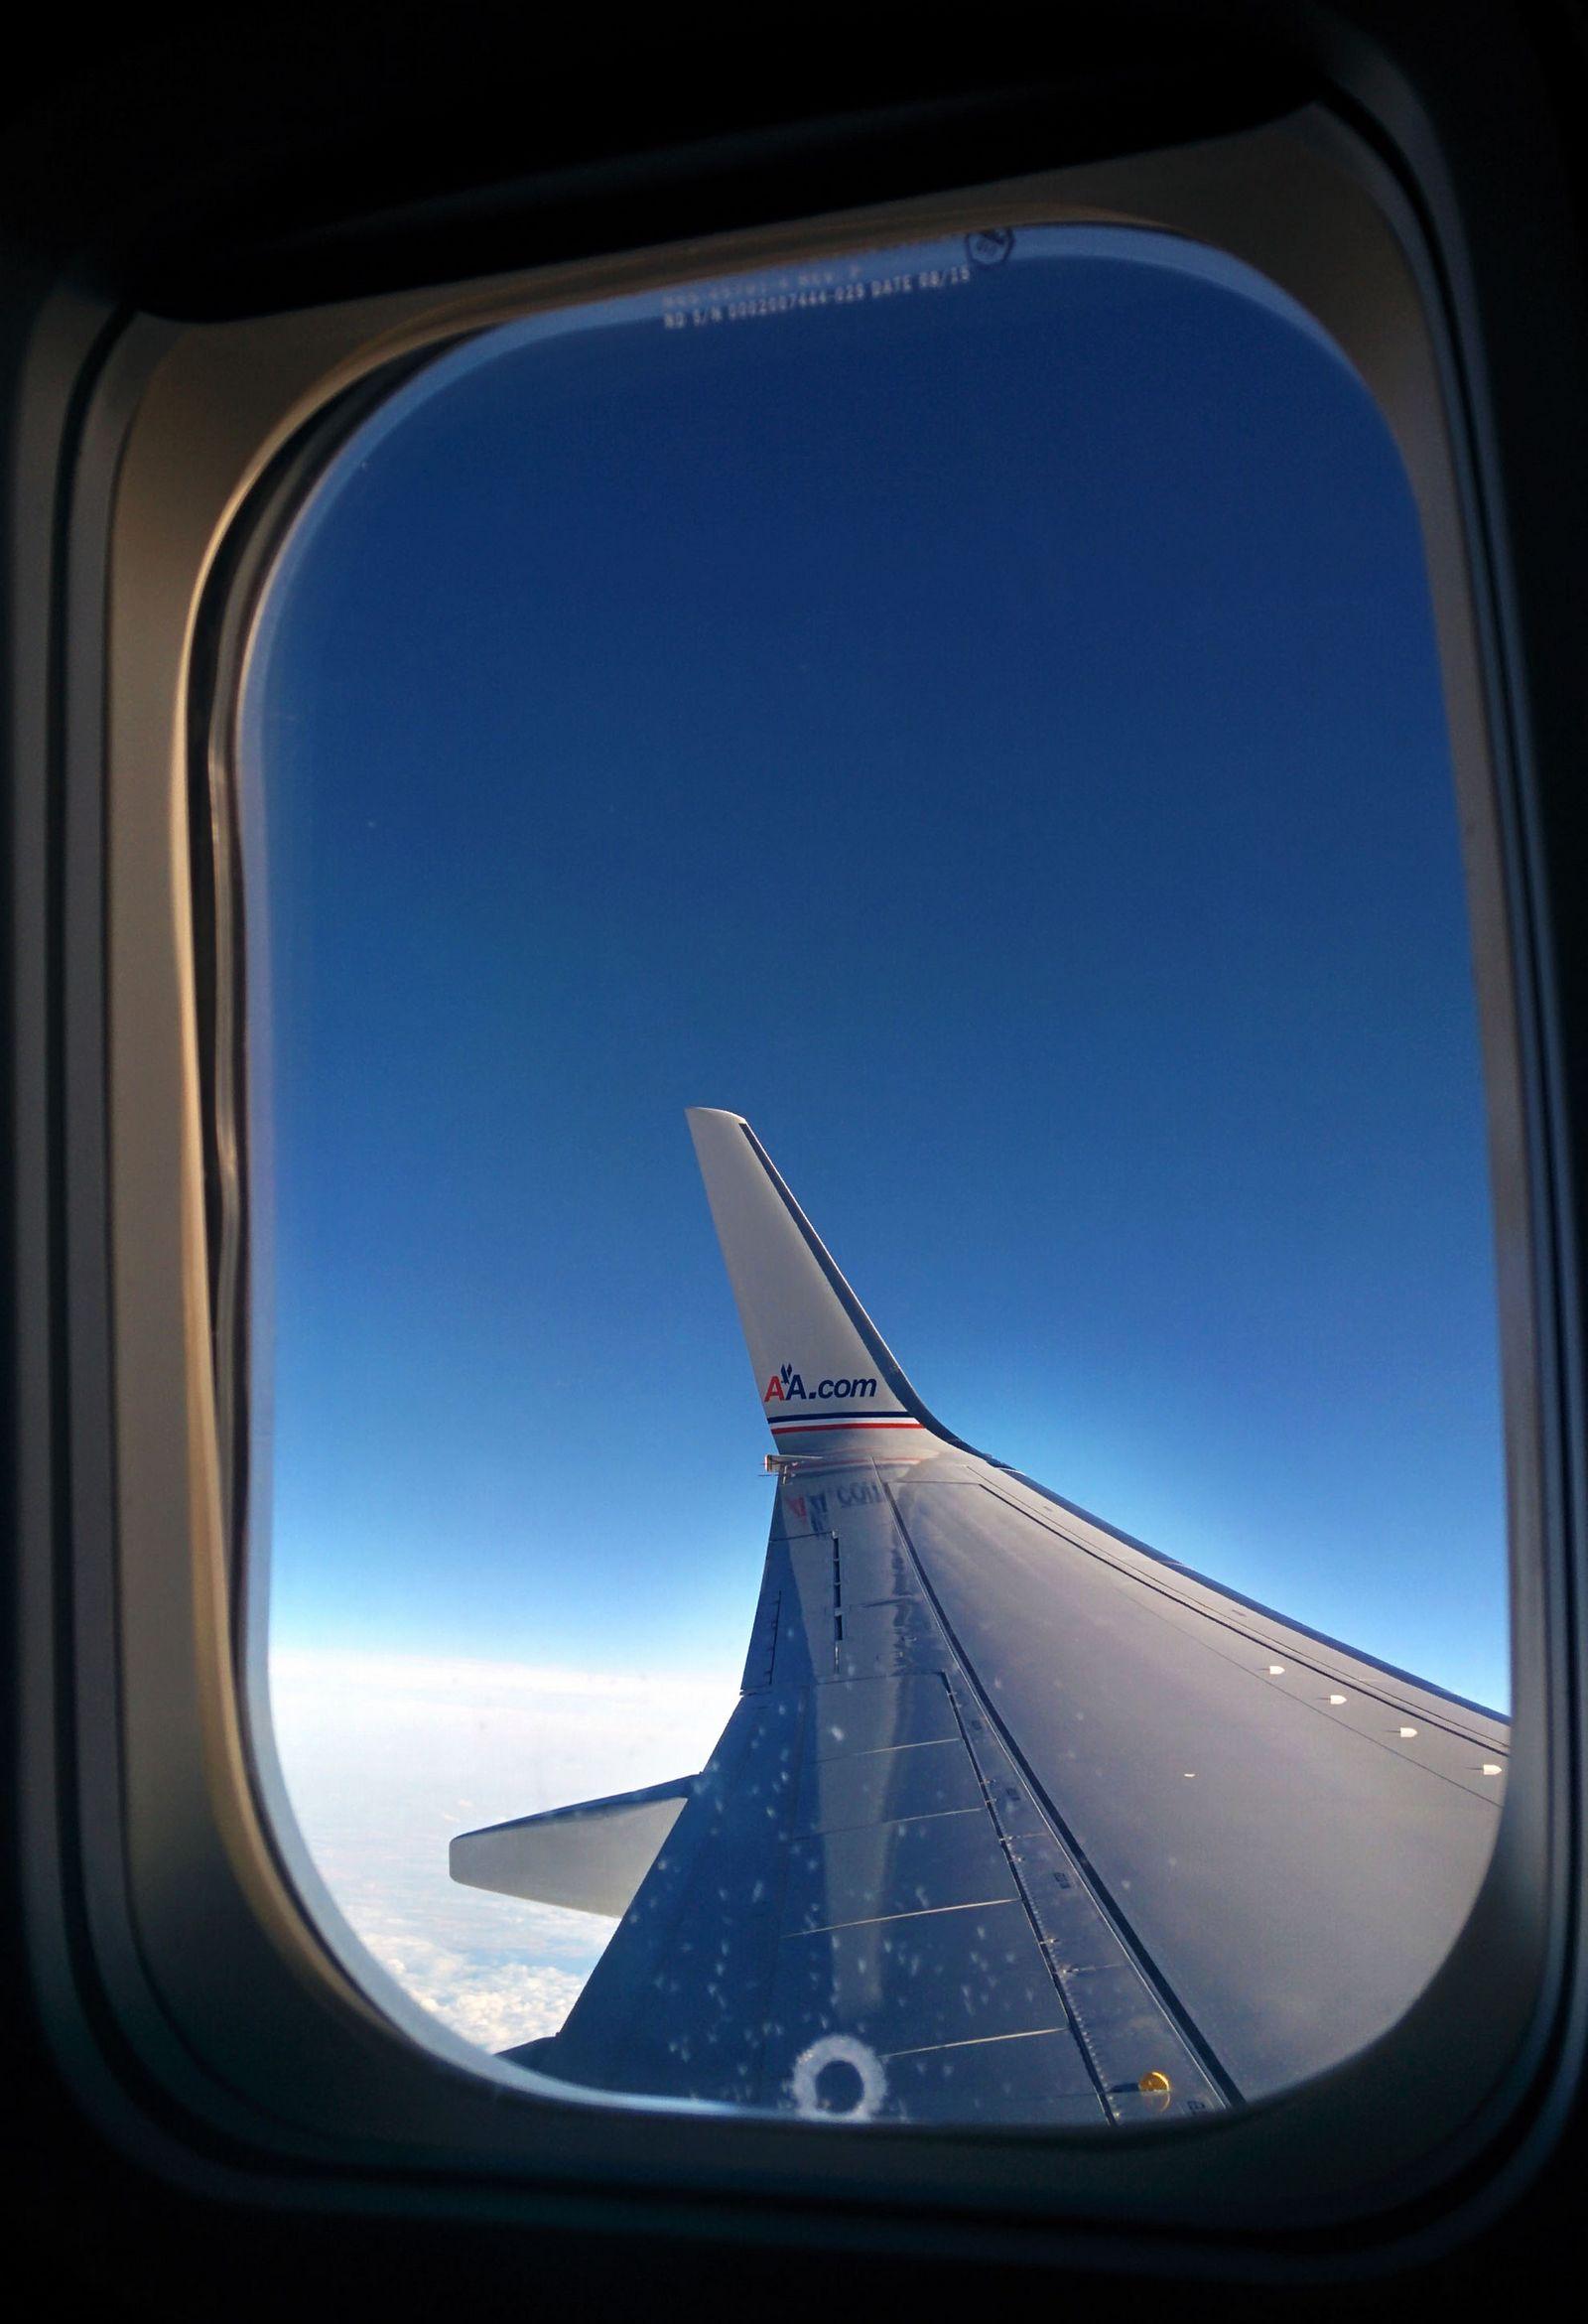 Volando con American Airlines